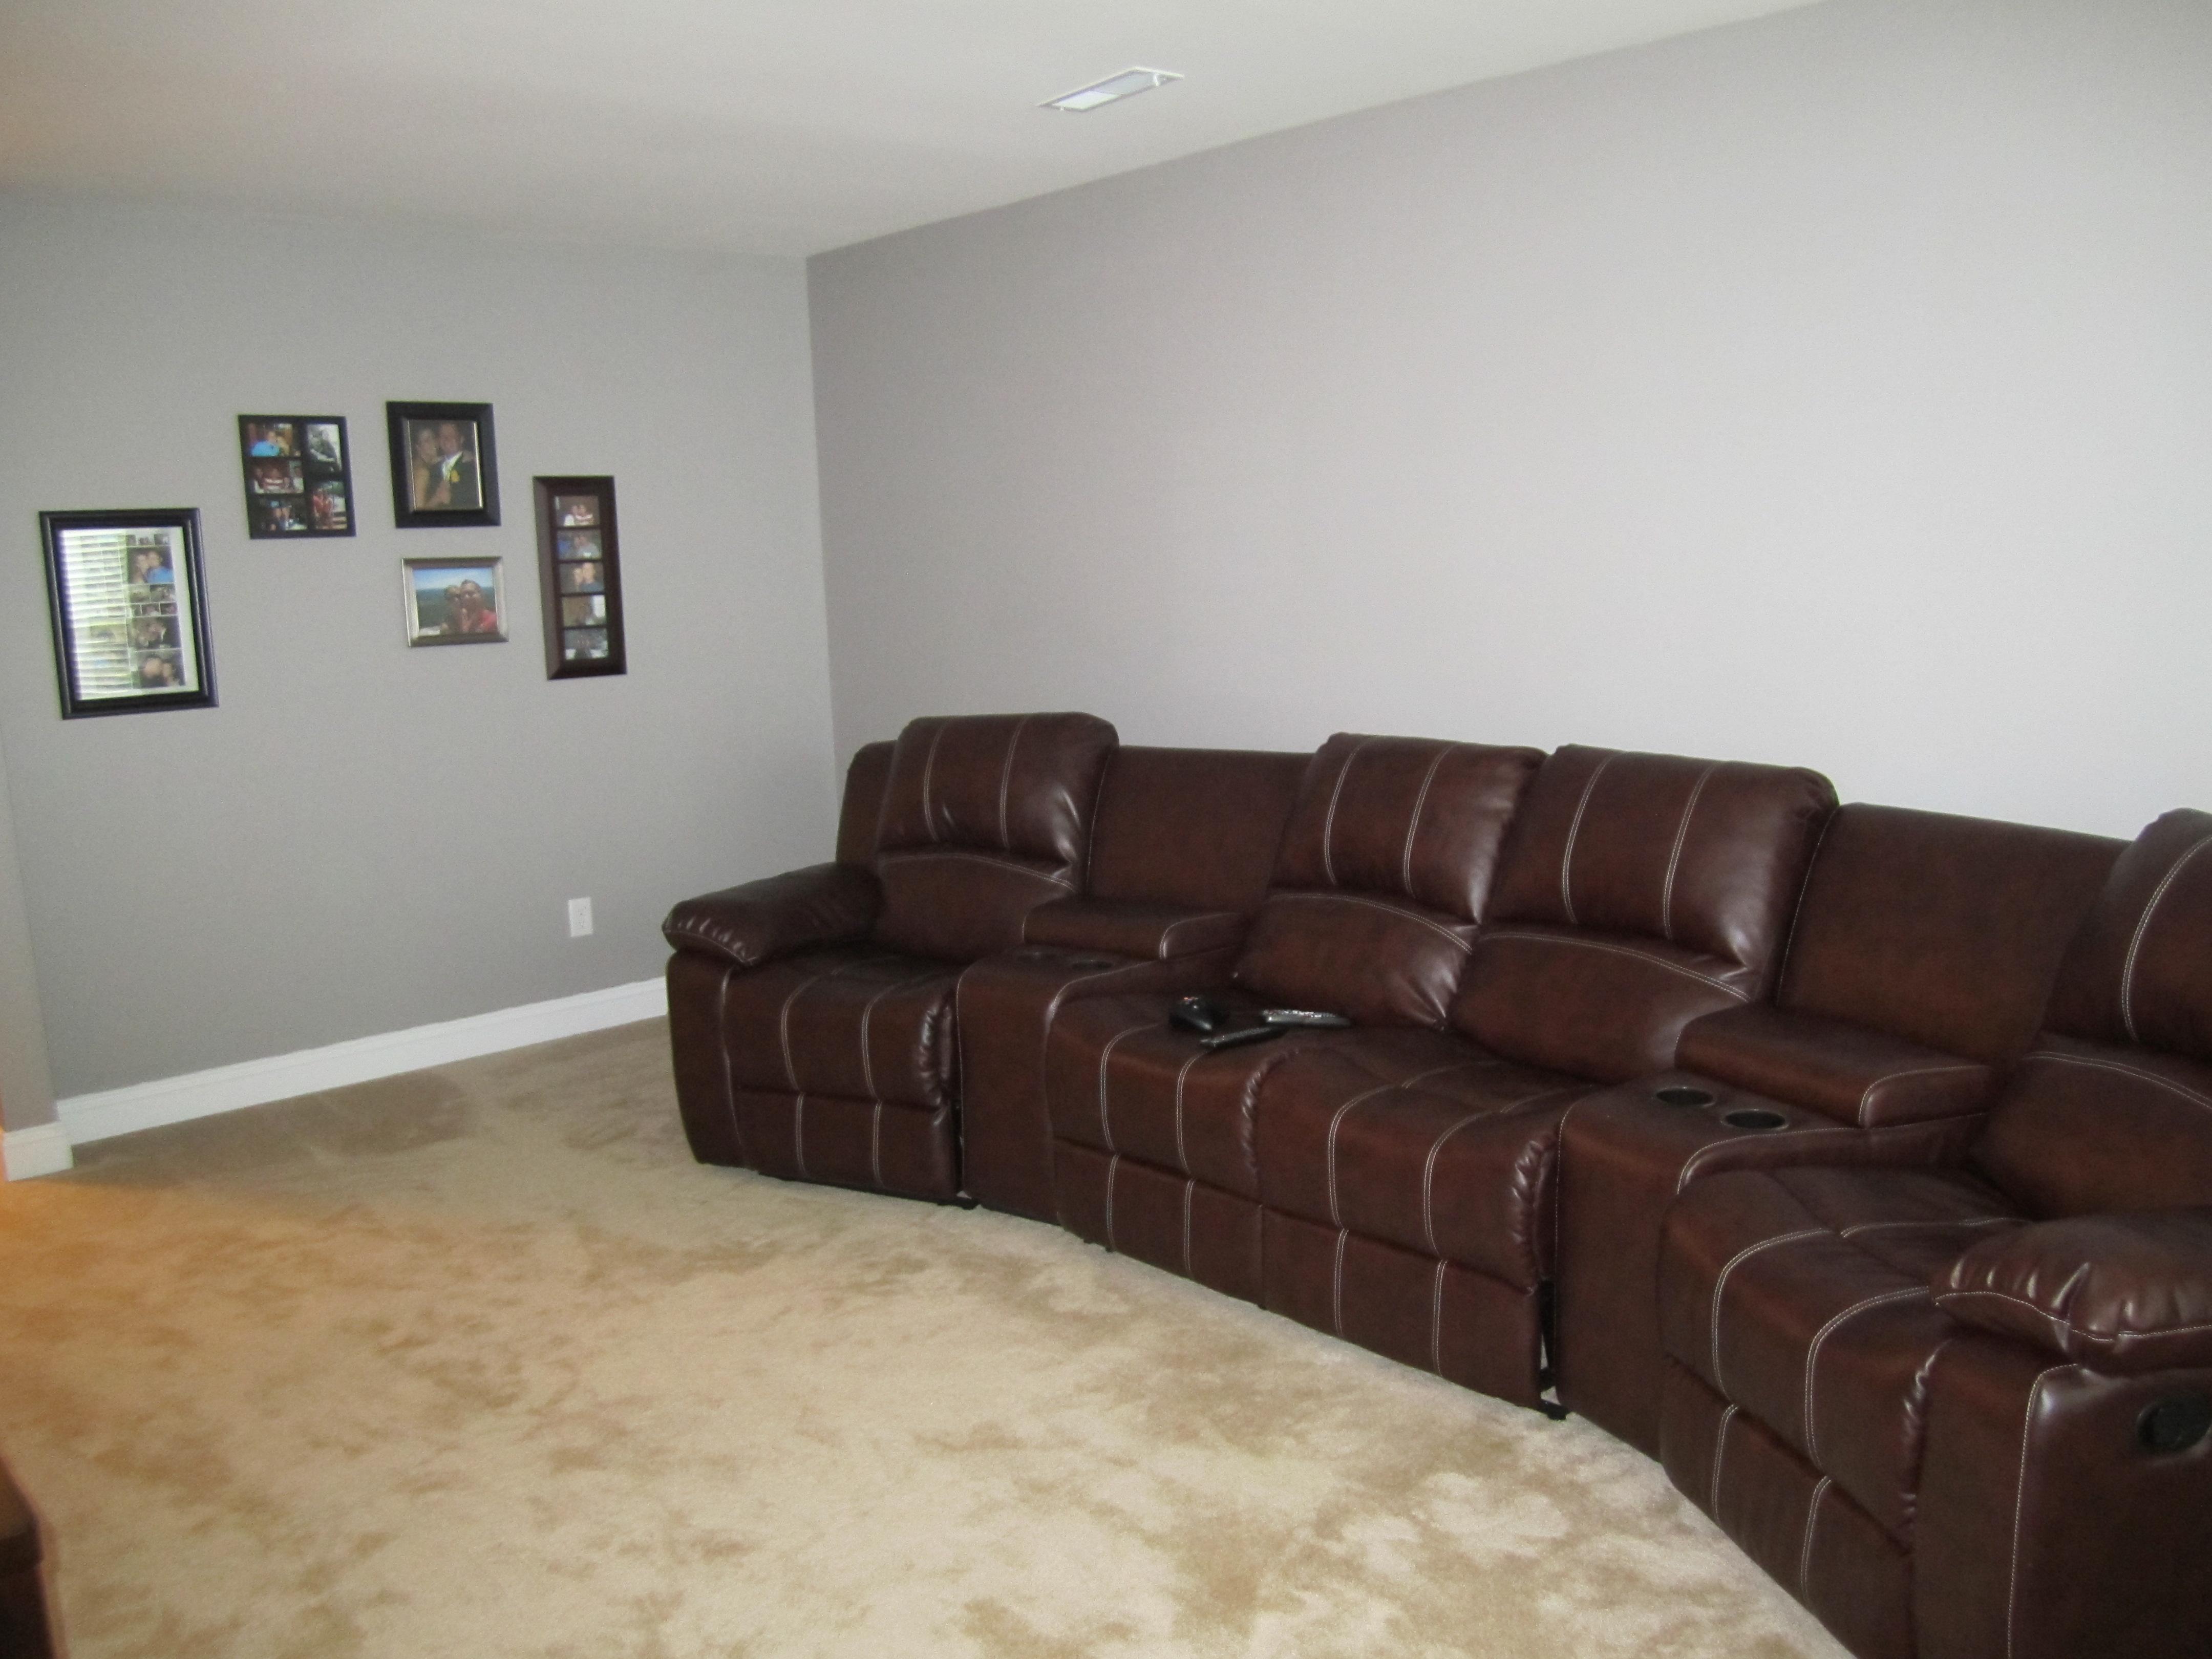 4 person reclining sofa legs menards june | 2012 bachsbythebeach